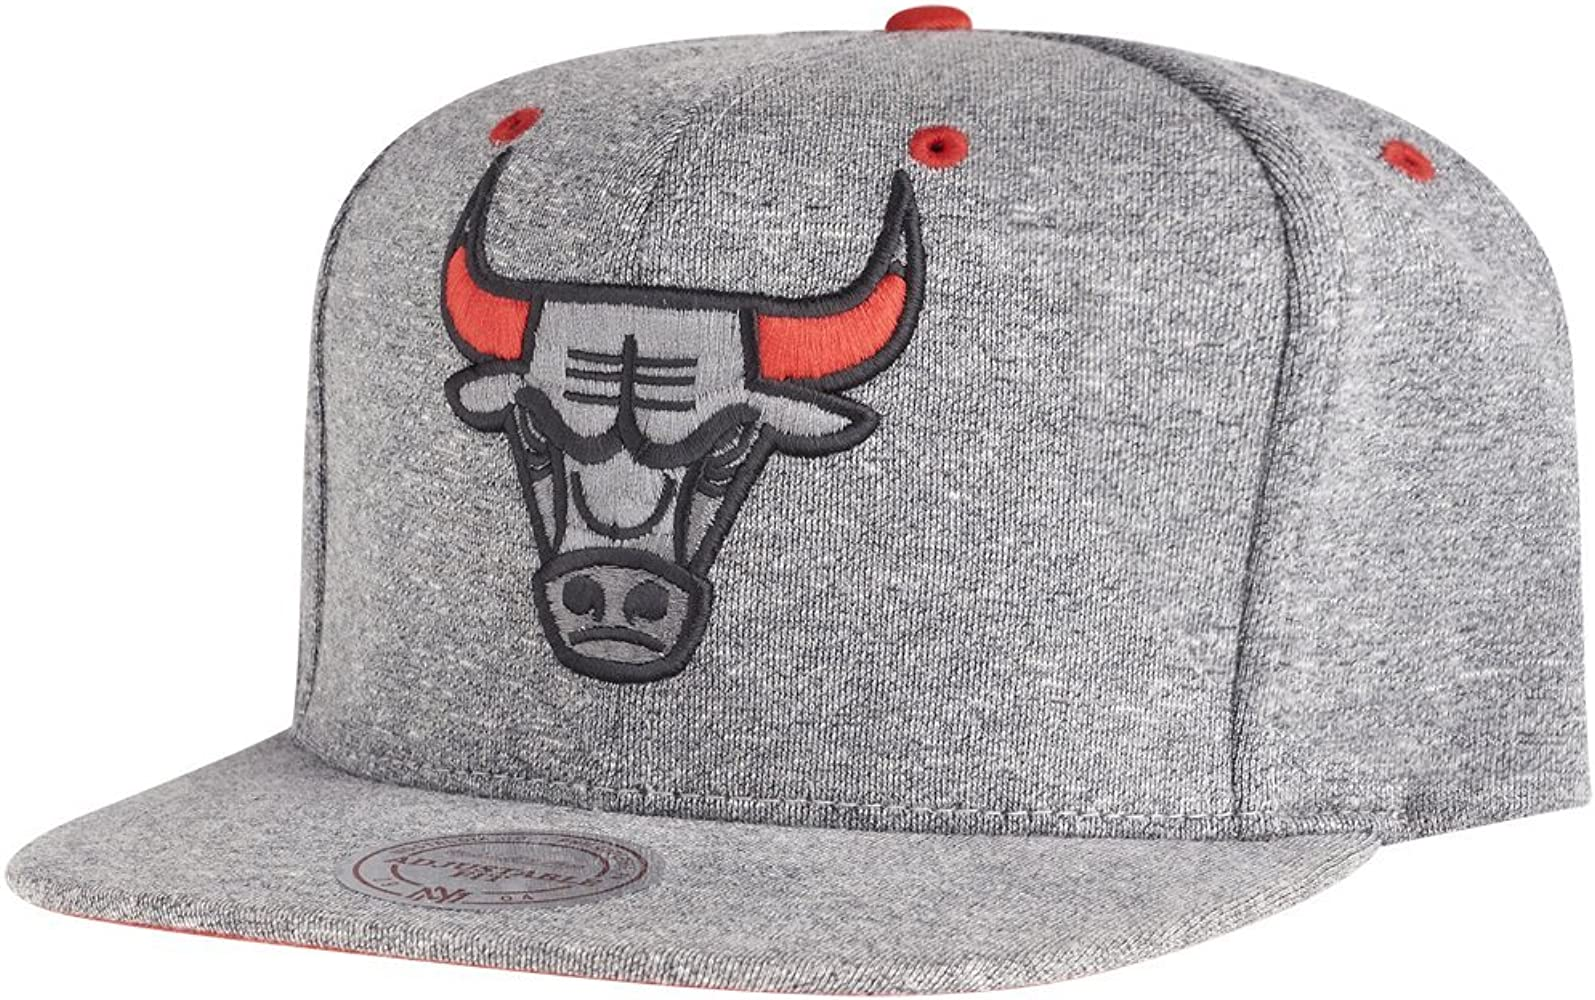 JERSEY Chicago Bulls grau Mitchell /& Ness Snapback Cap